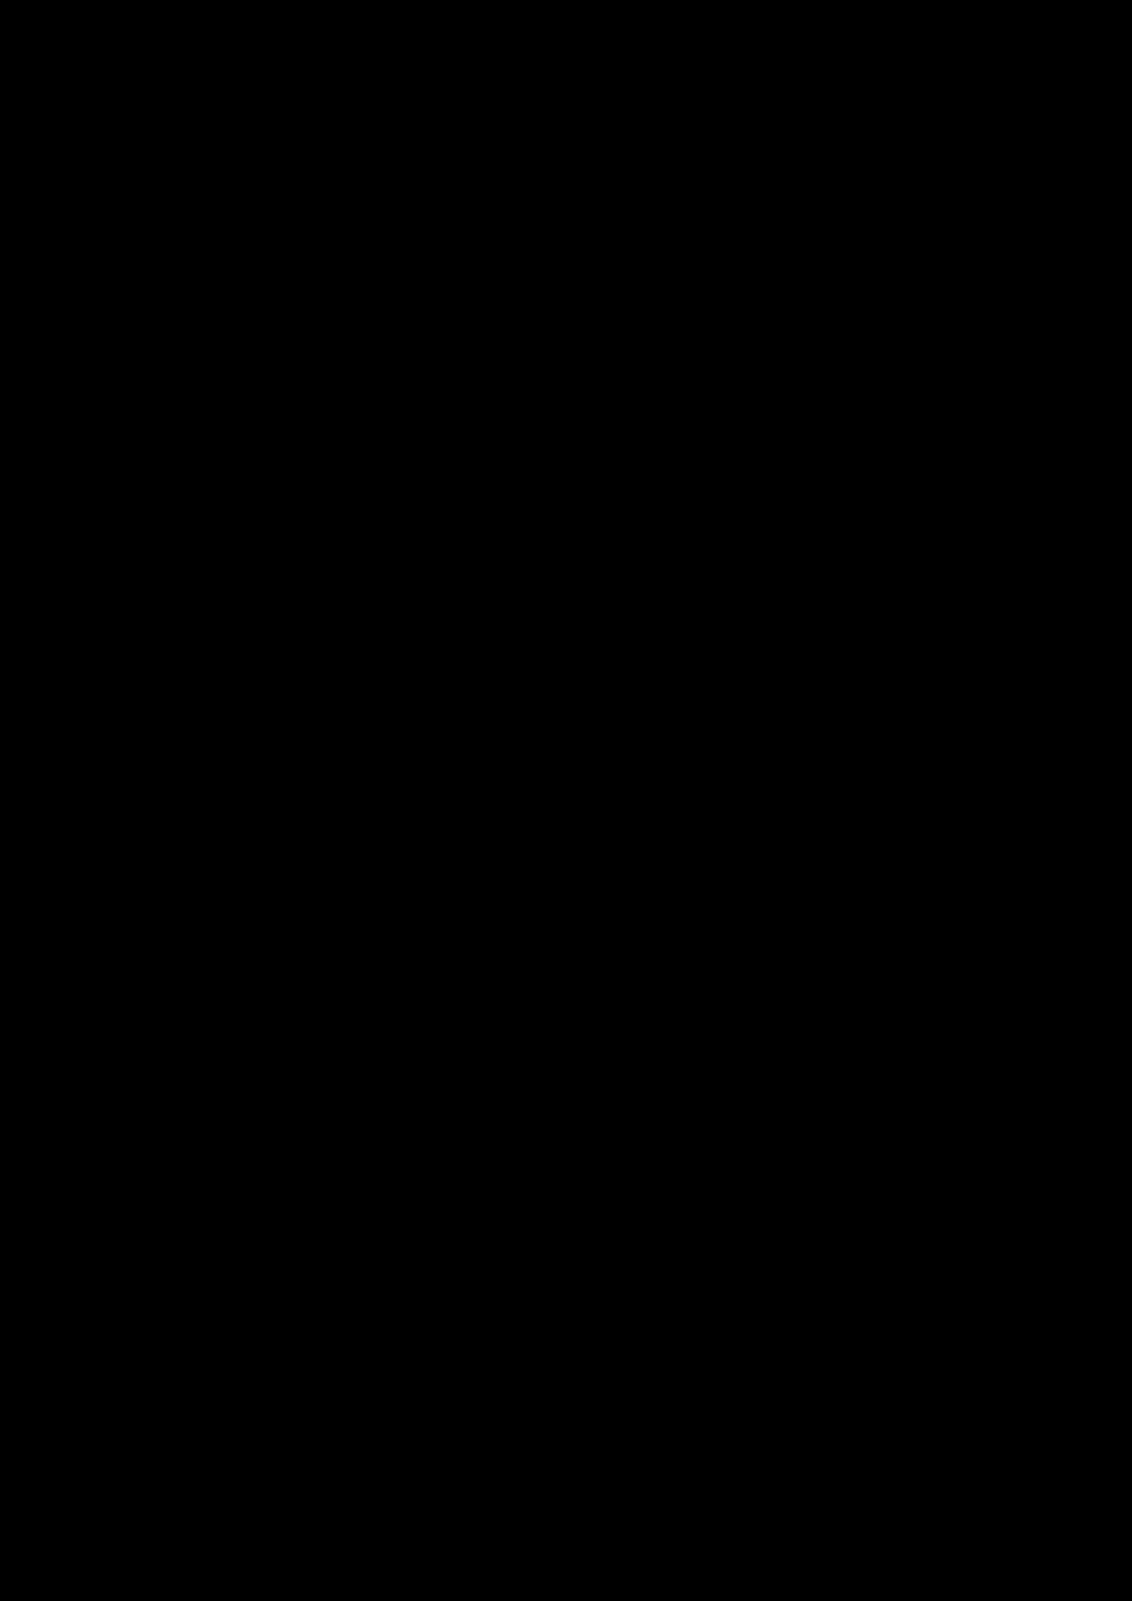 18 berez slide, Image 6